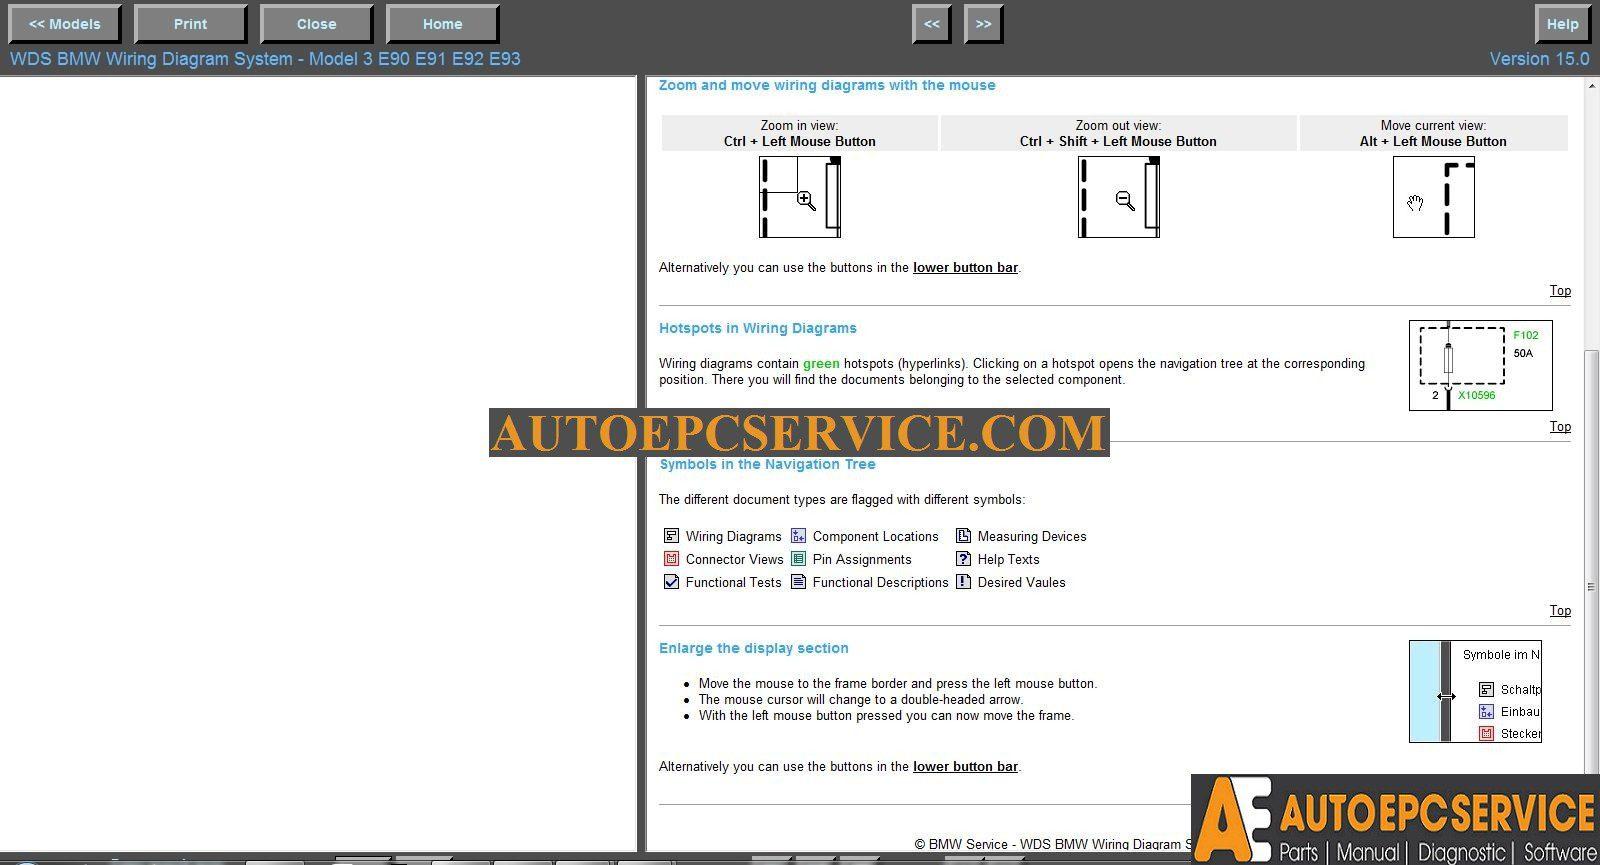 Strange Bmw Wds V15 And Mini Wds V7 Wiring Diagram System Auto Repair Wiring Database Redaterrageneticorg